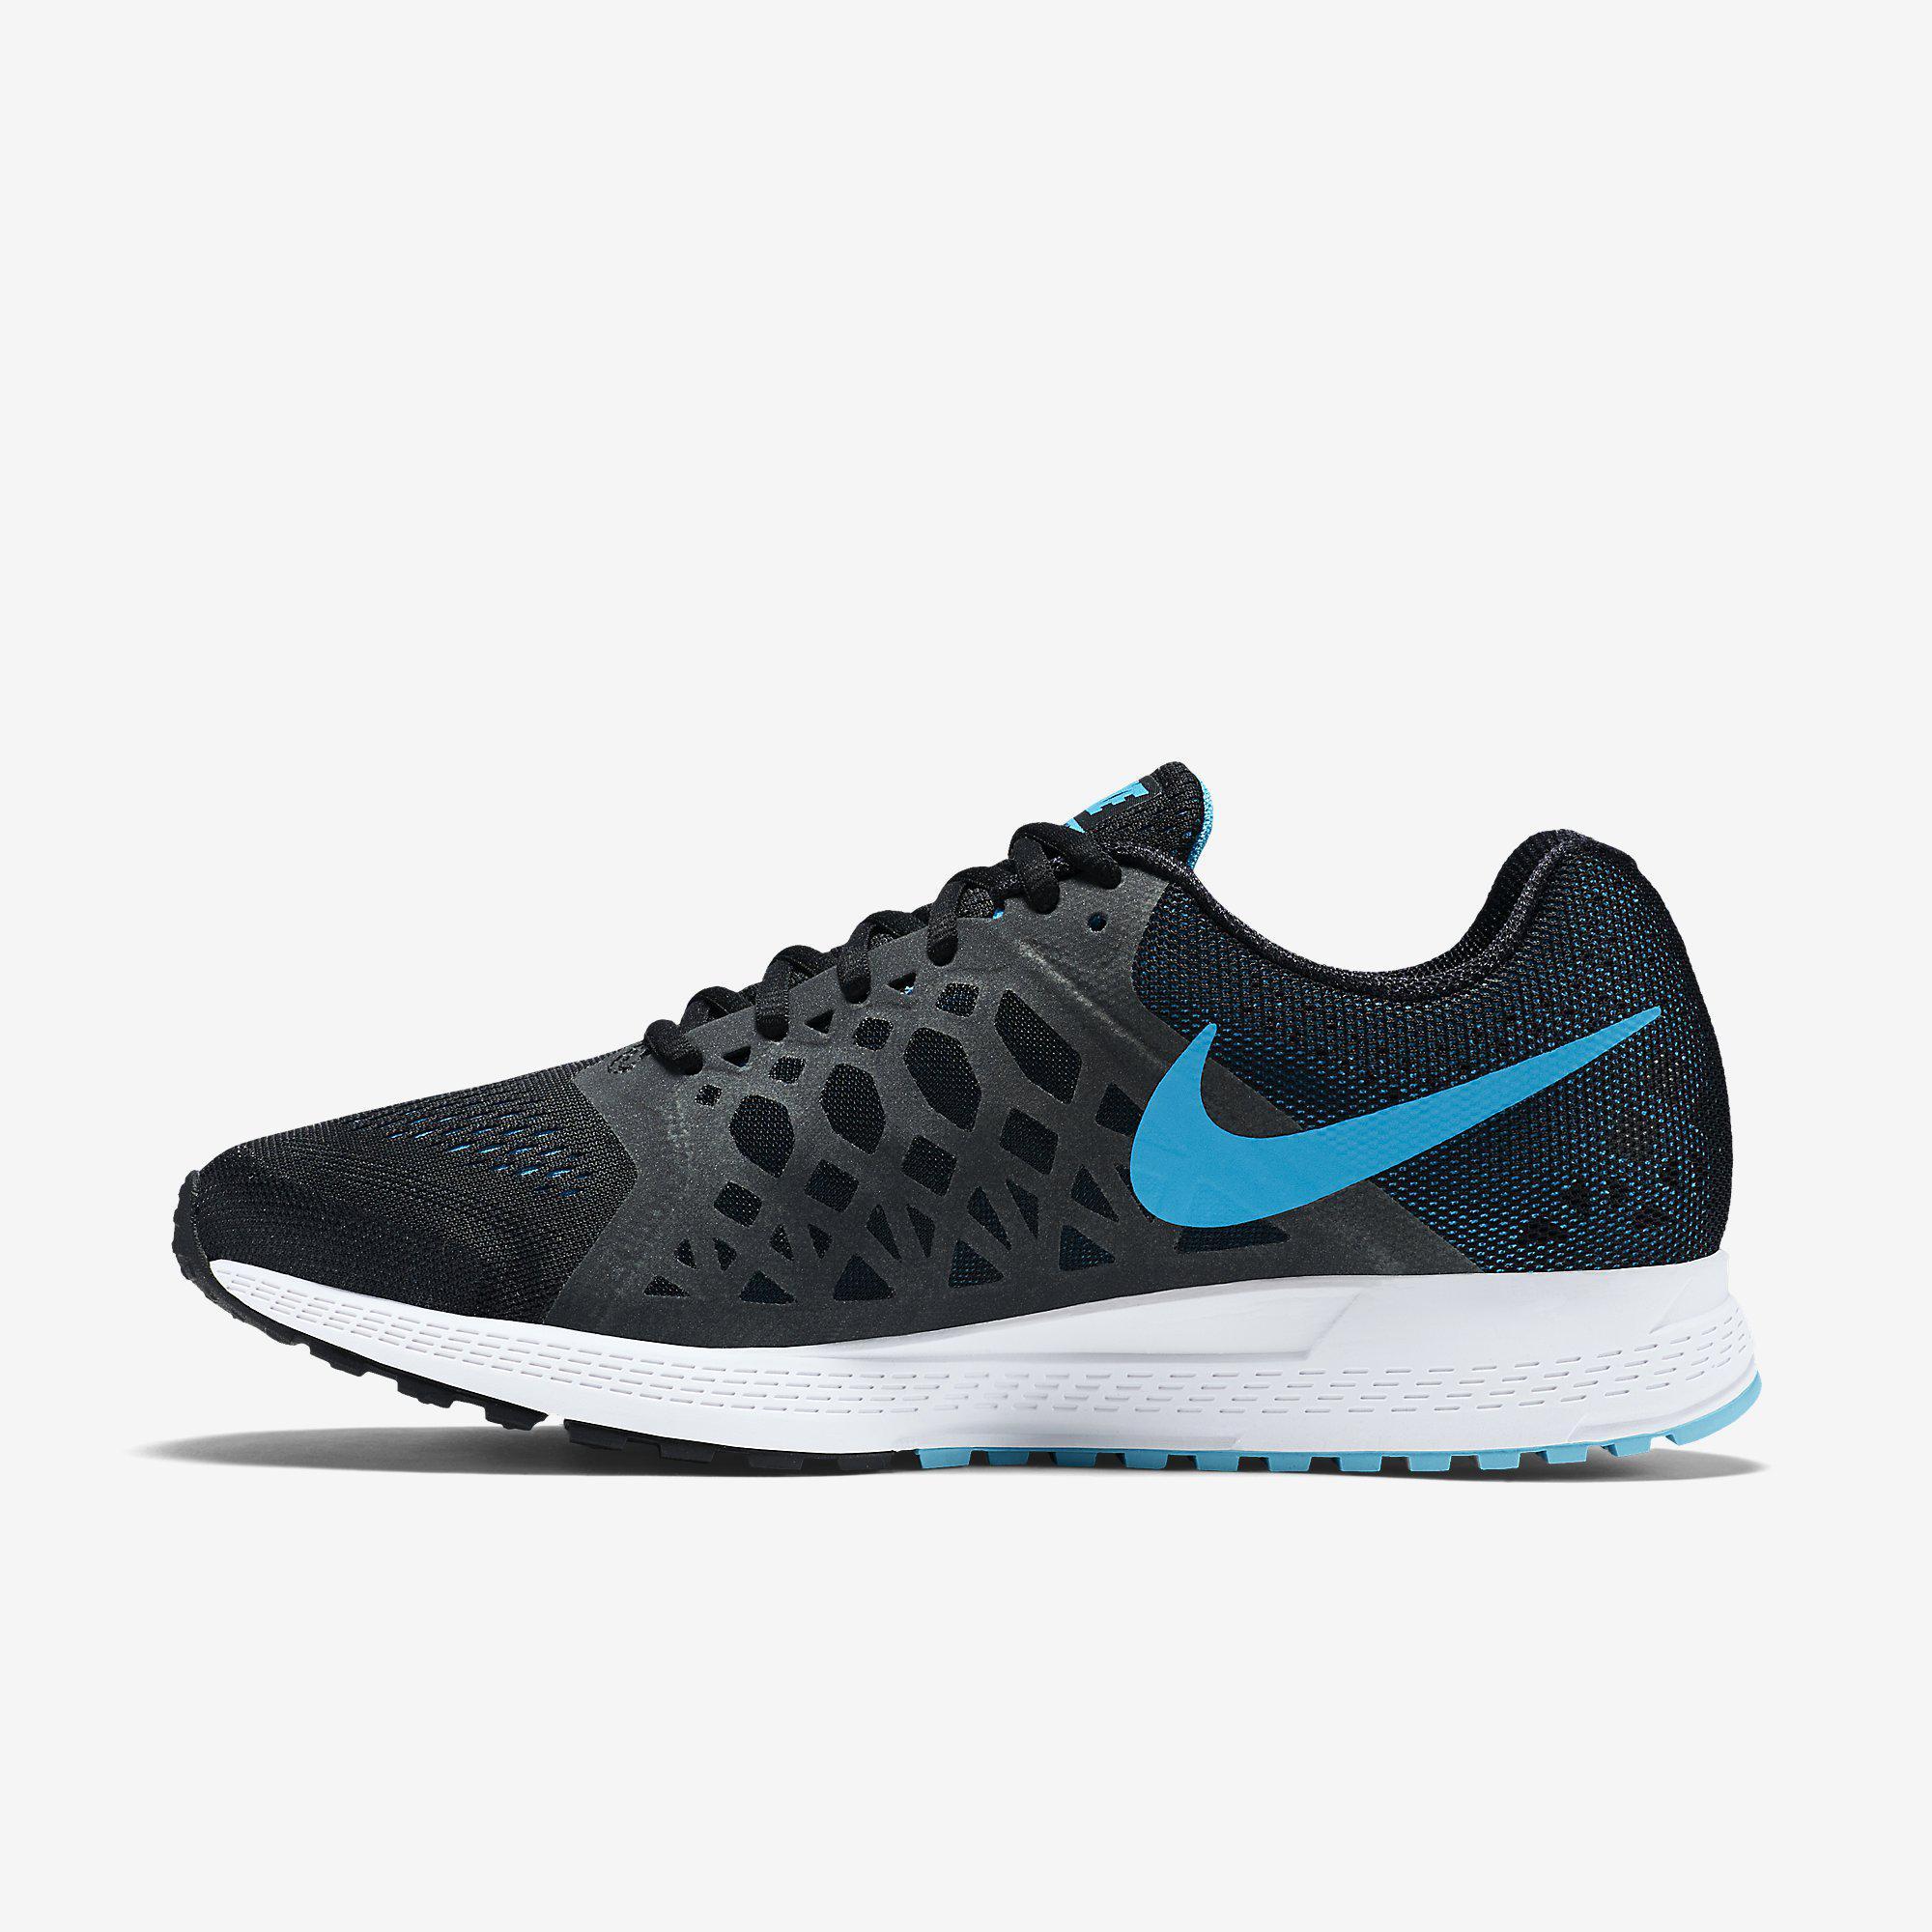 the latest 2feb1 0afcc Nike Mens Air Zoom Pegasus+31 Running Shoes - Black White Blue